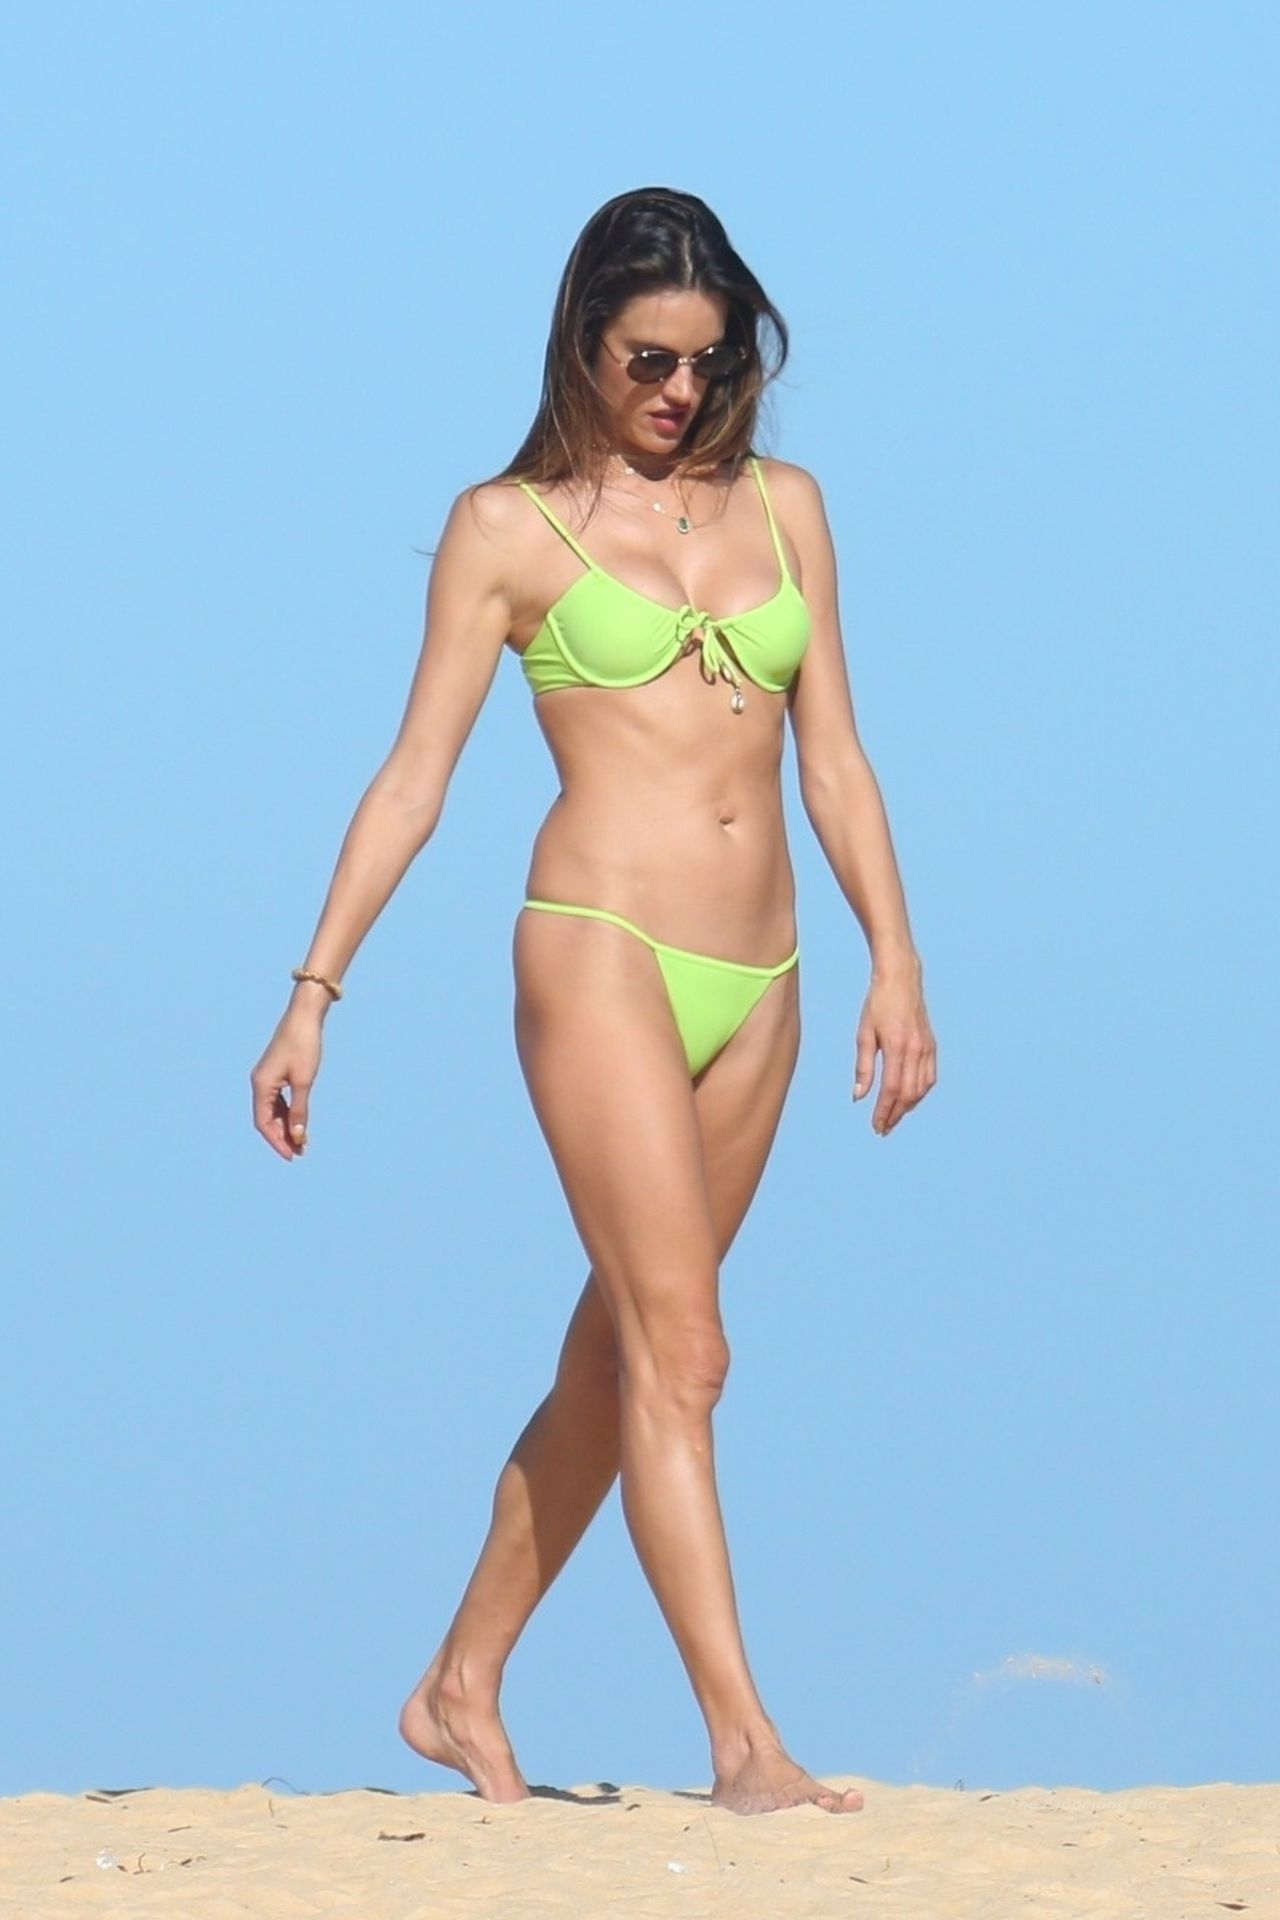 Alessandra-Ambrosio-Sexy-The-Fappening-Blog-141.jpg